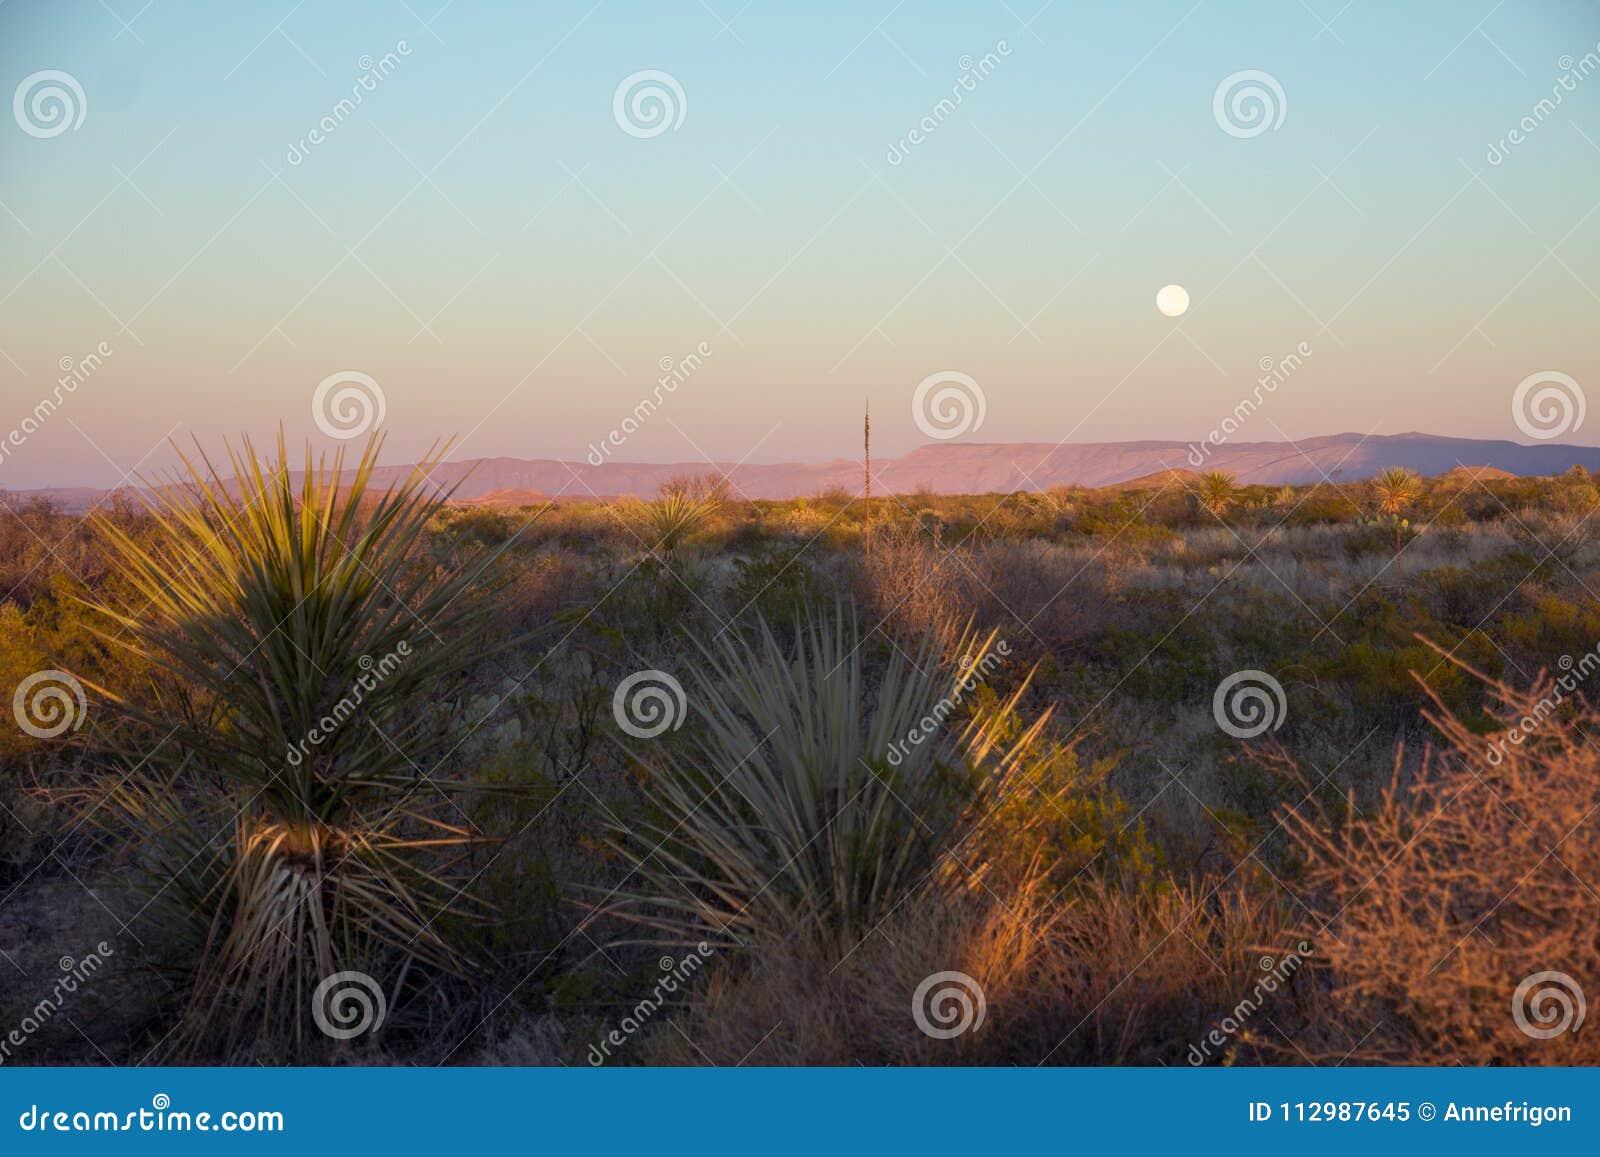 Full moon rises over arid Southen Texas